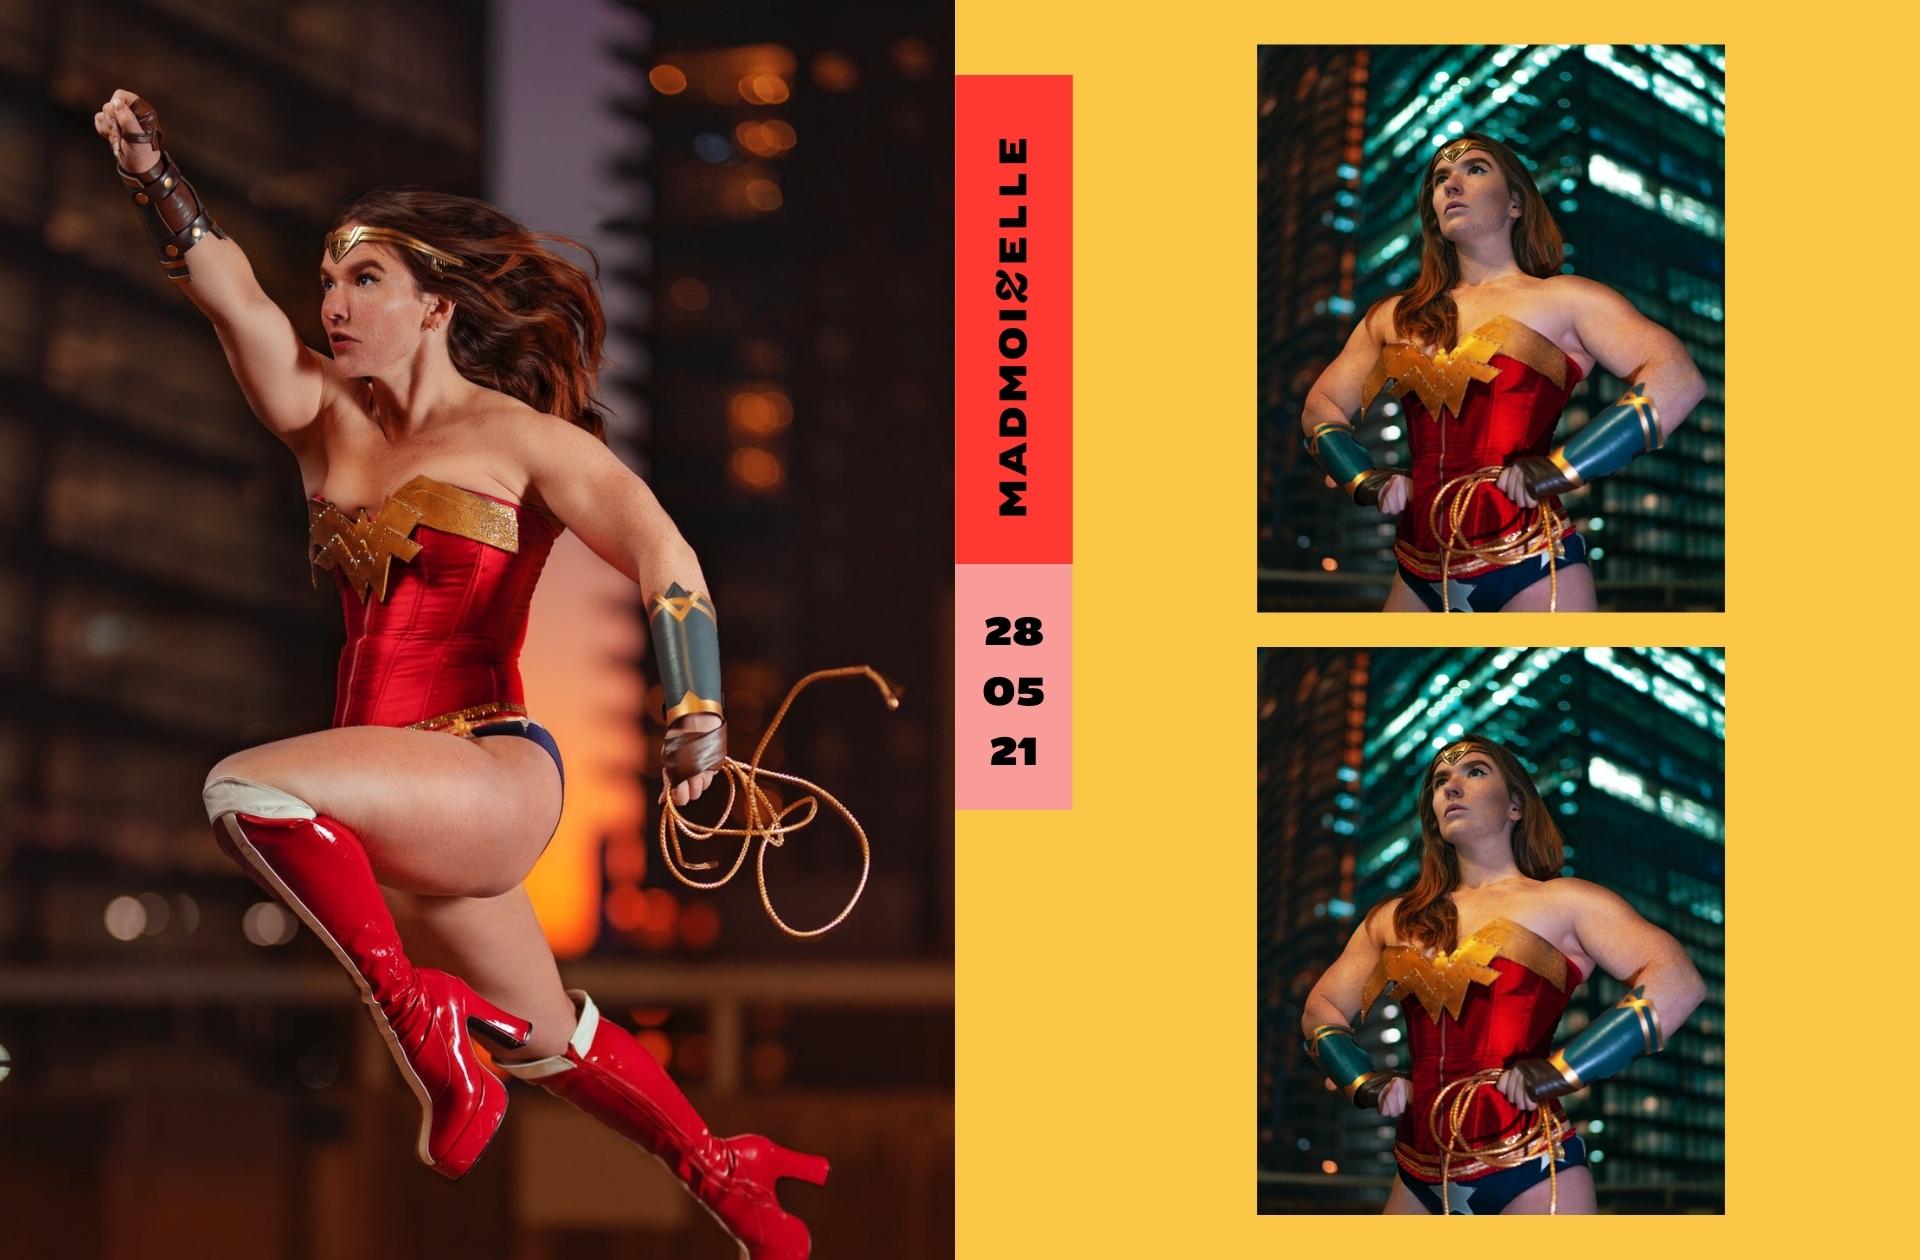 Wonder Woman, Tornade… ce que les super-héroïnes disent de nos sociétés (et ce qu'elles en diront demain)